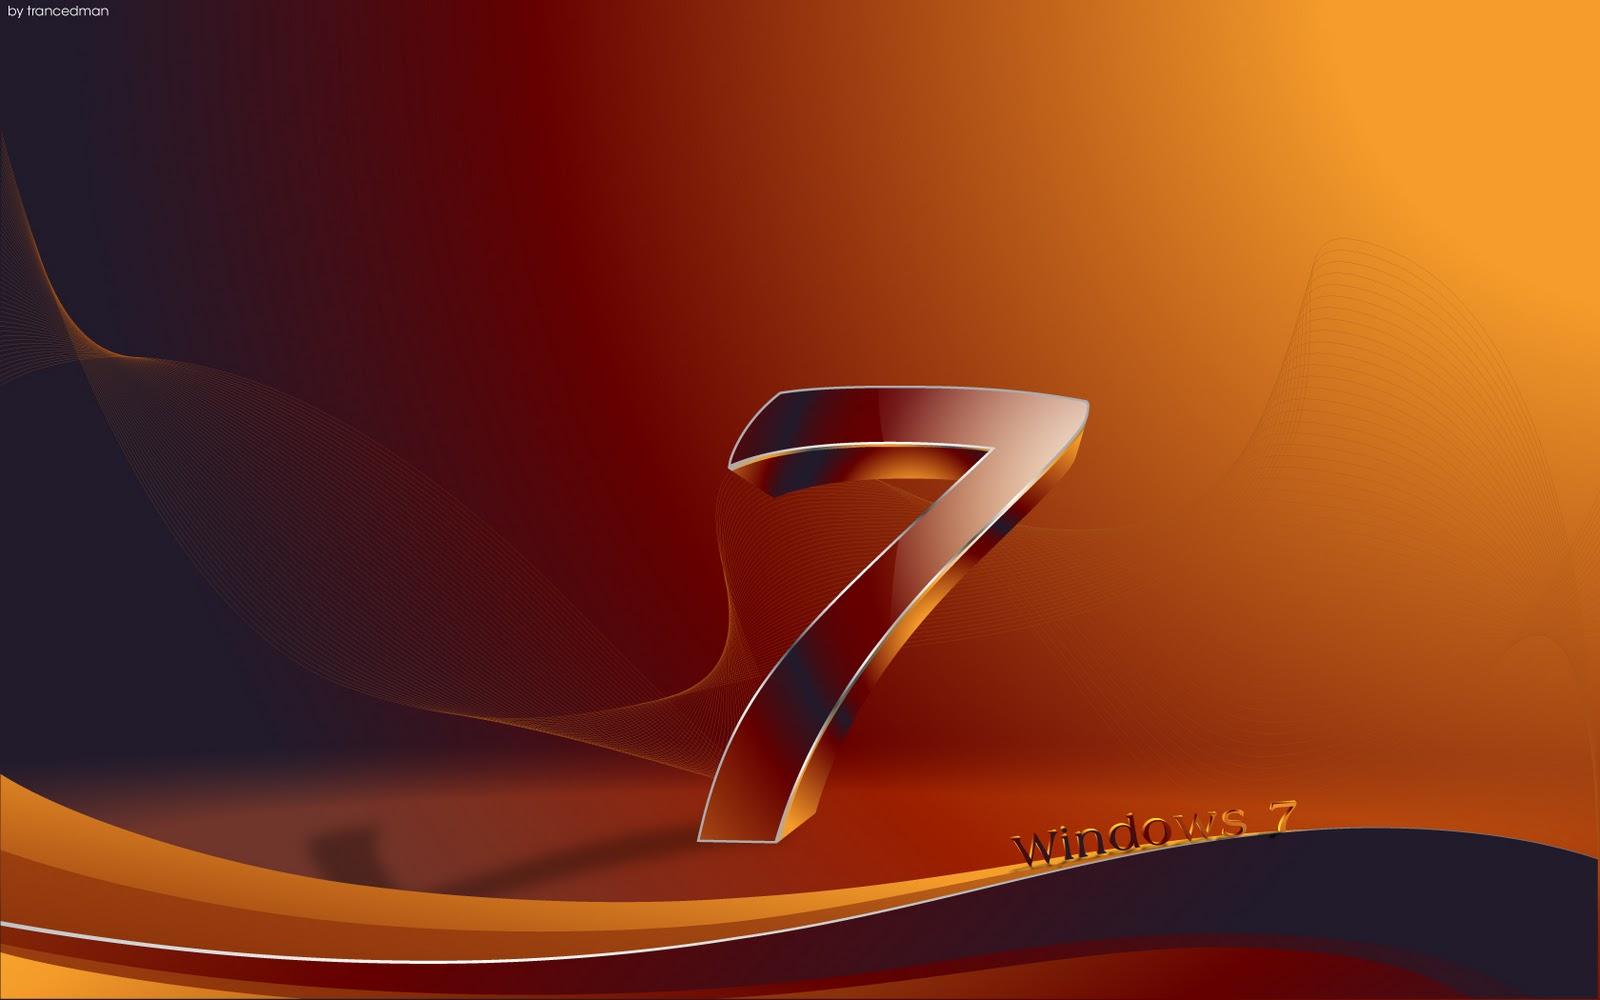 Free Wallpaper Download: Top 10 Microsoft Windows 7 wallpaper HD